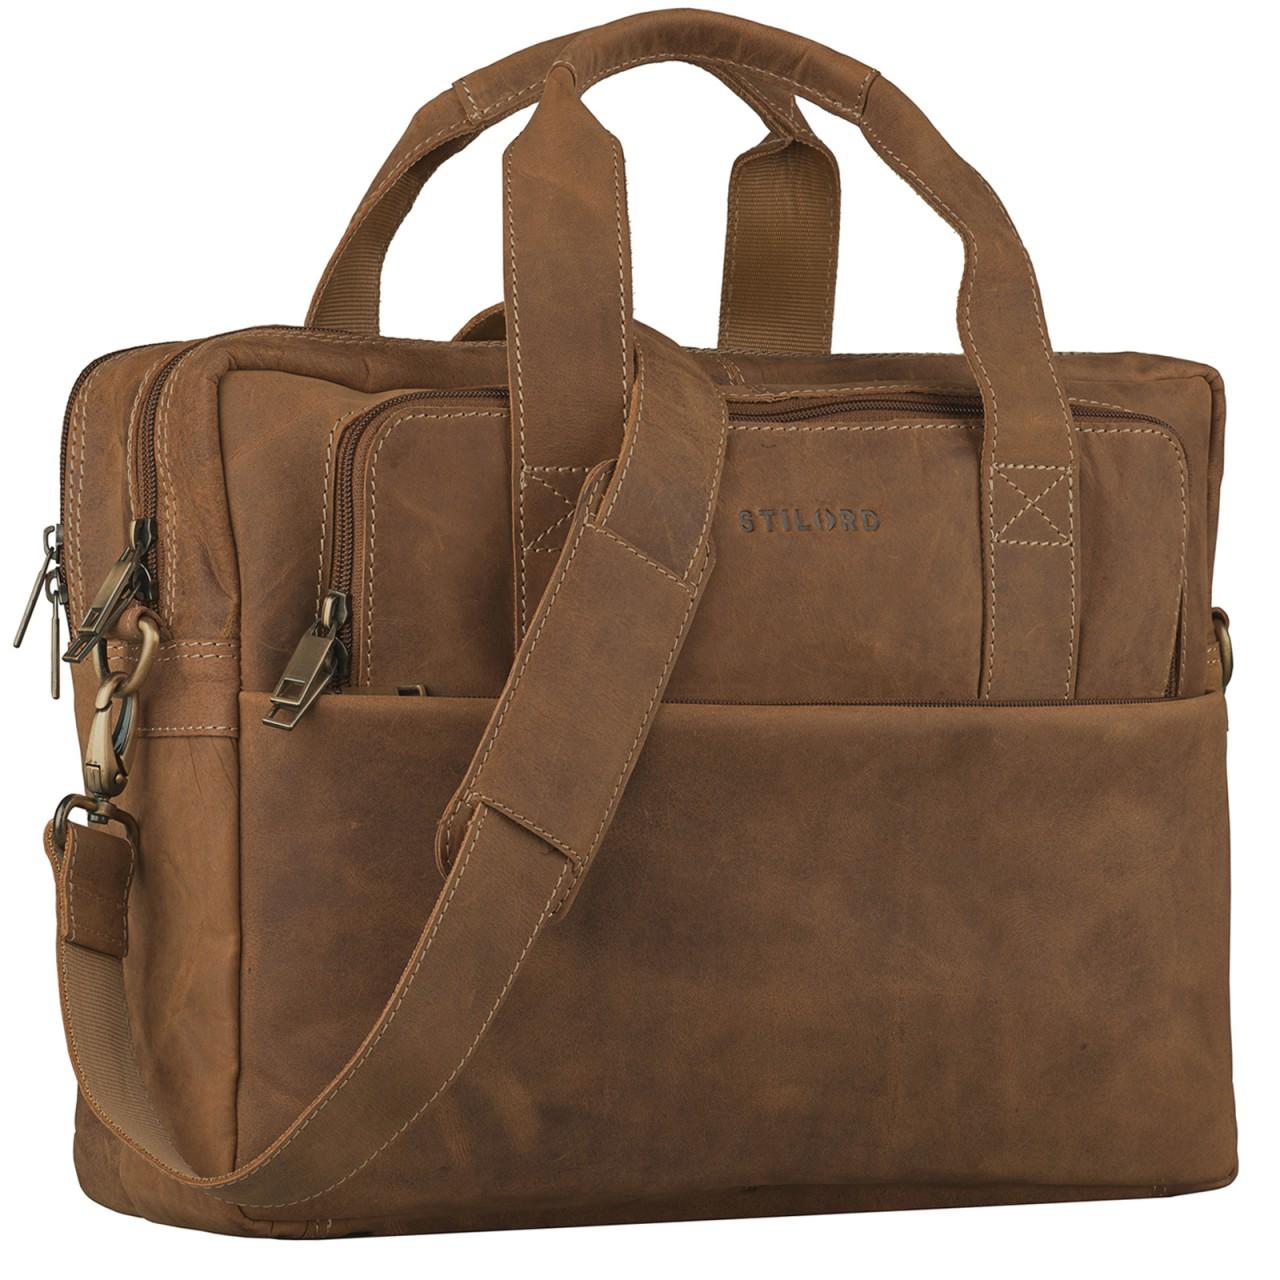 STILORD Vintage Herren Umhängetasche Leder groß Ledertasche Büro Business Studium Uni Lehrertasche Tabletfach 12 Zoll echtes Rinds Leder Braun - Bild 1